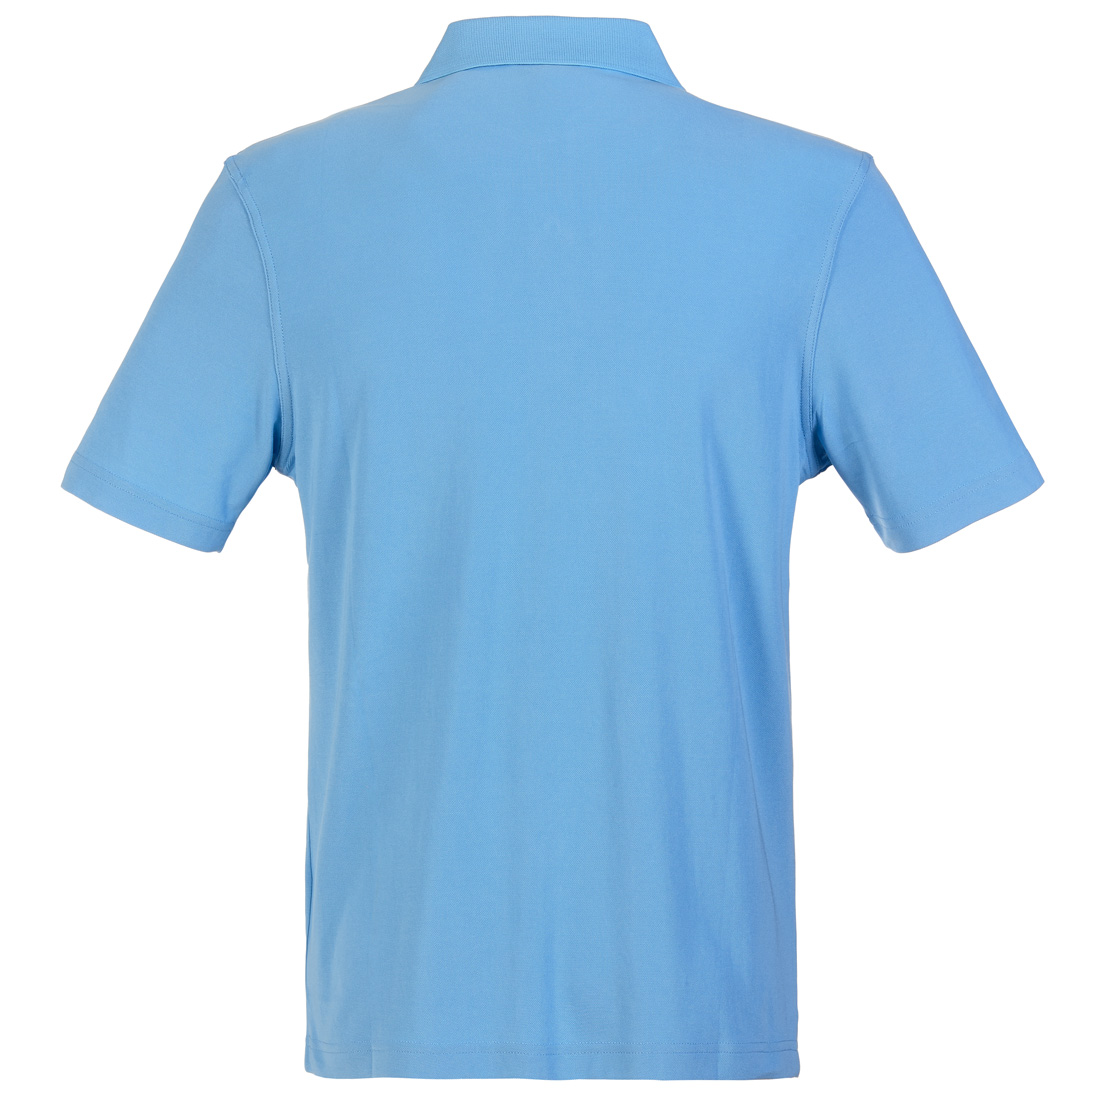 Golf Performance Wear Herren Kurzarm Polohemd mit Moisture Management